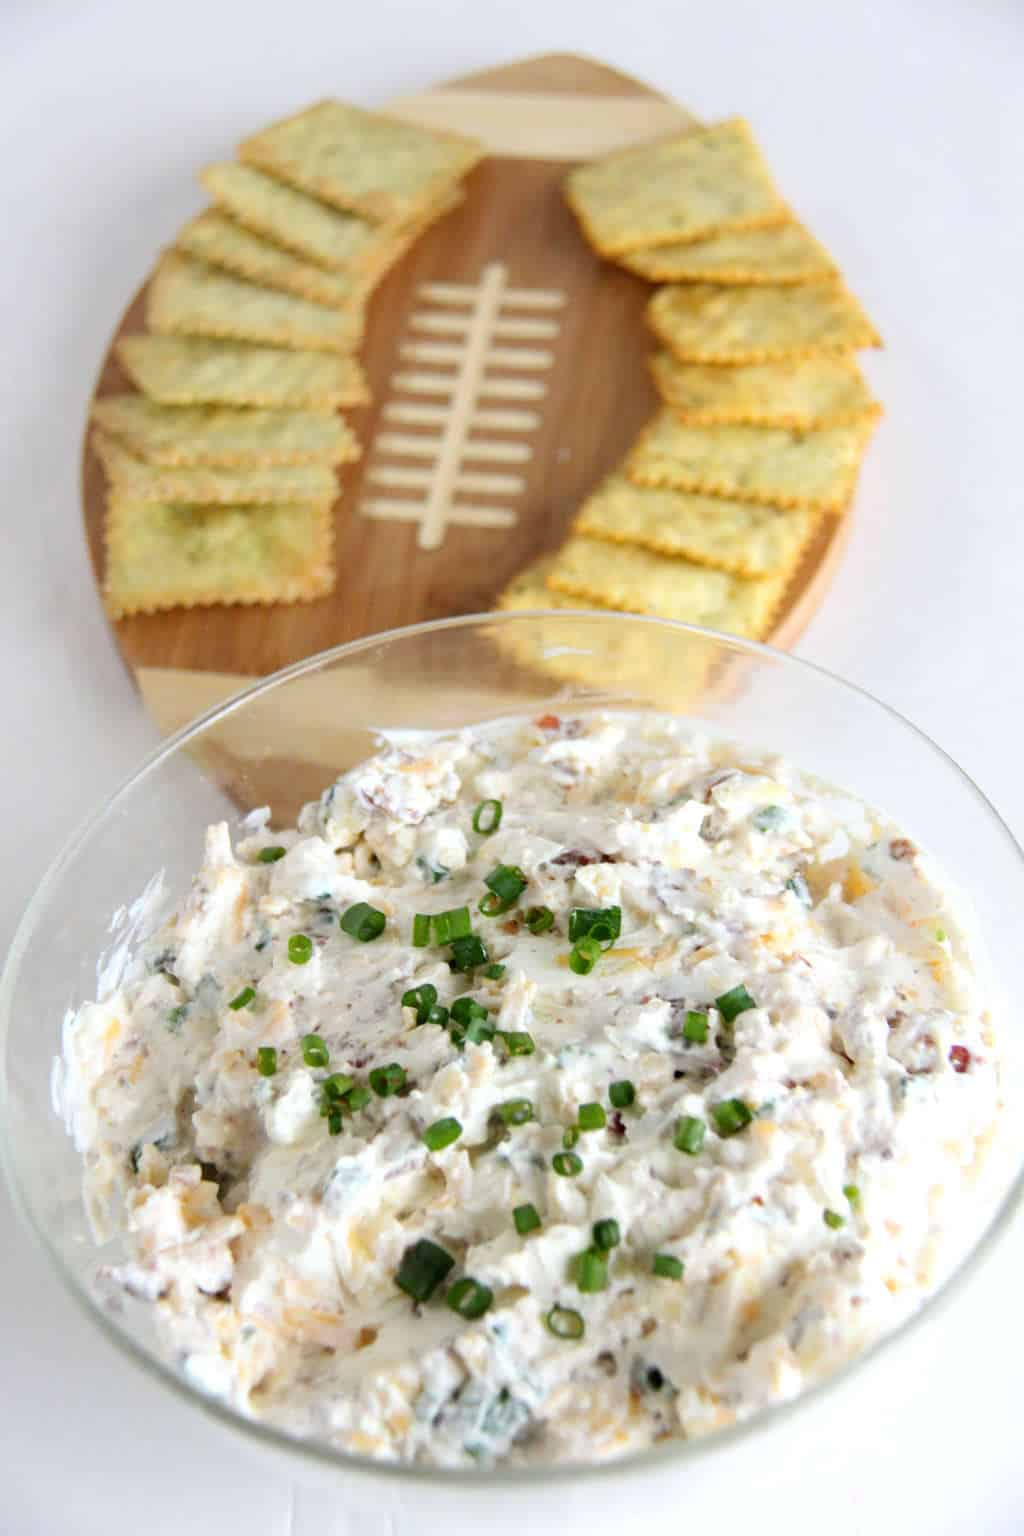 Loaded Potato Dip | Superbowl Recipes | Football Food | www.madewithHAPPY.com